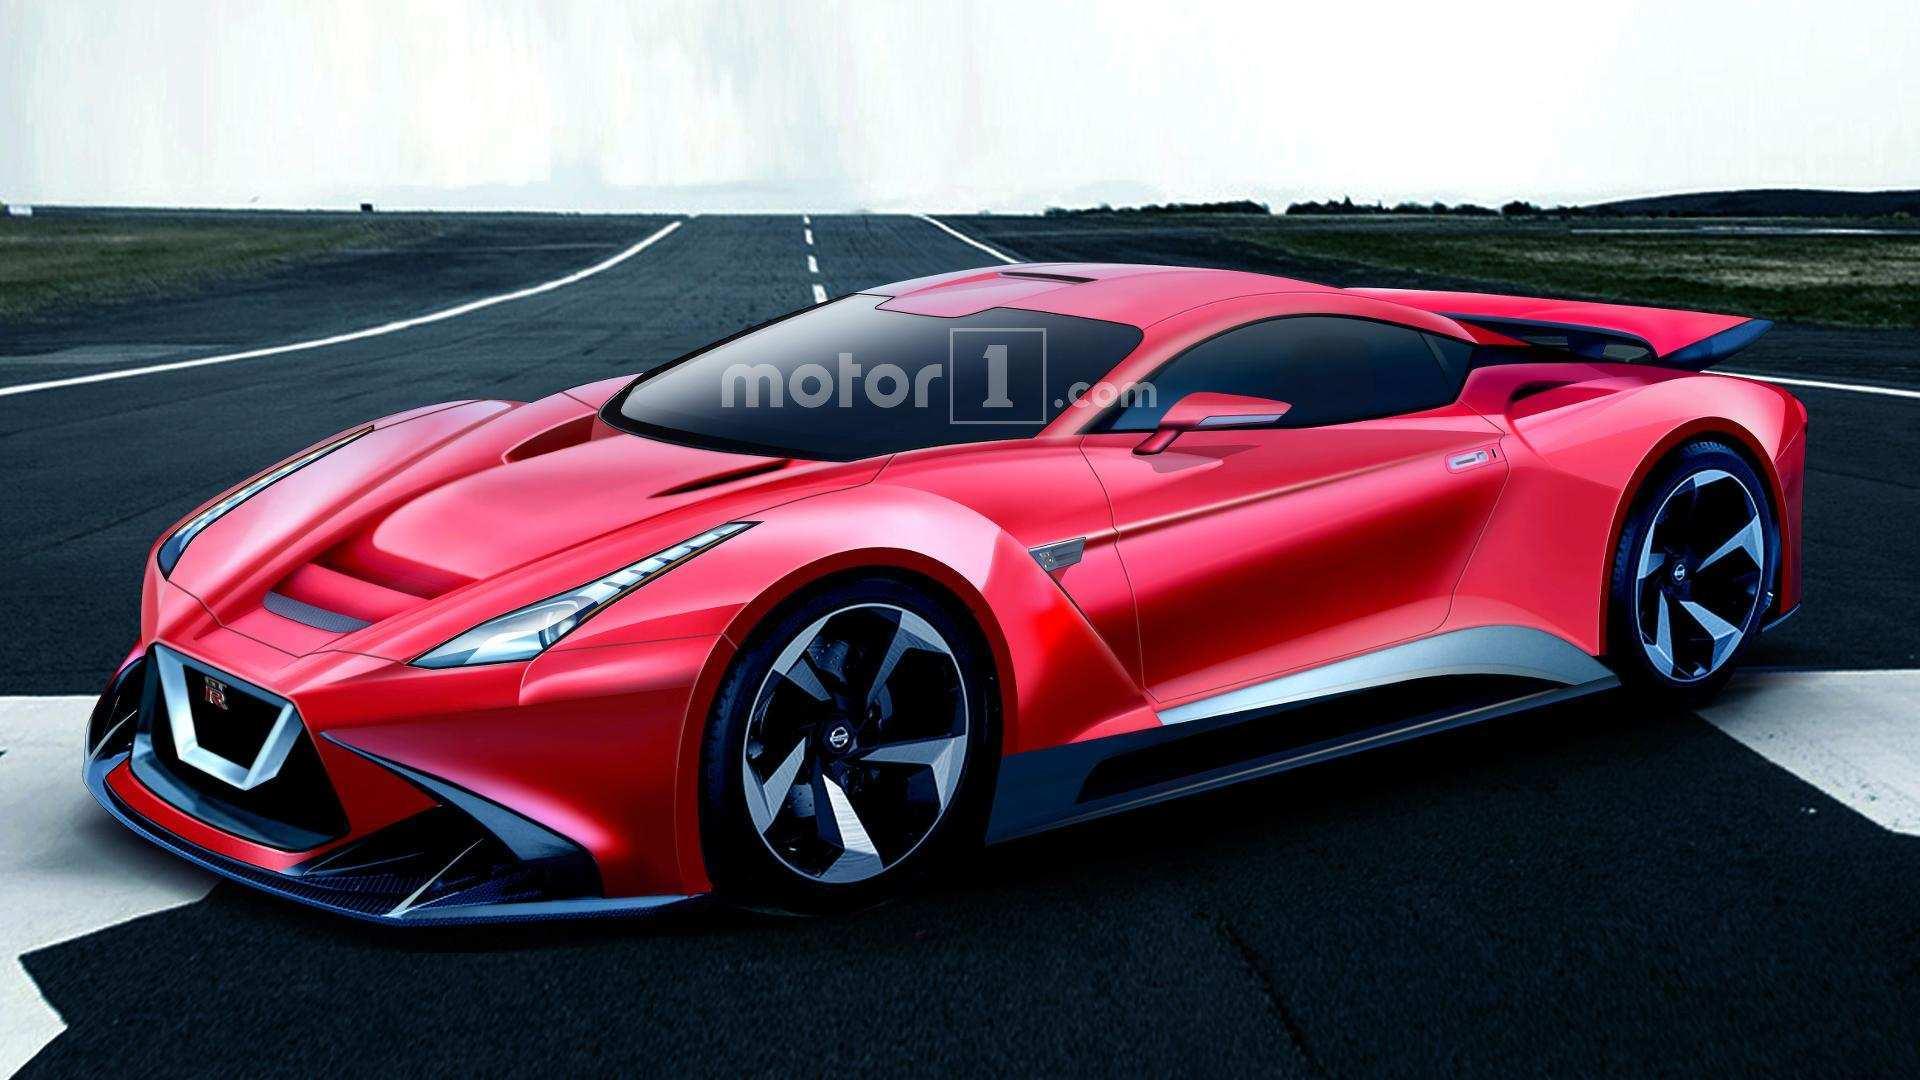 67 Great 2020 Nissan Gtr Horsepower Pricing with 2020 Nissan Gtr Horsepower